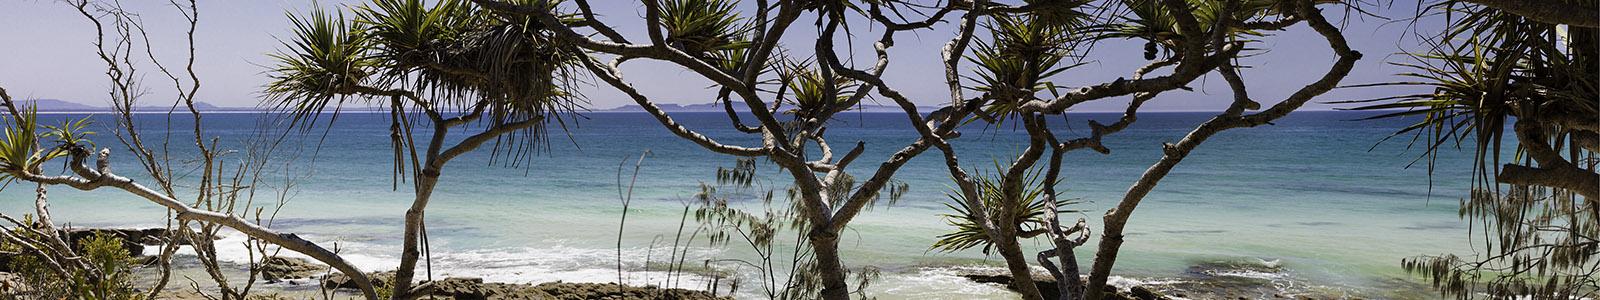 Australian Beach 9